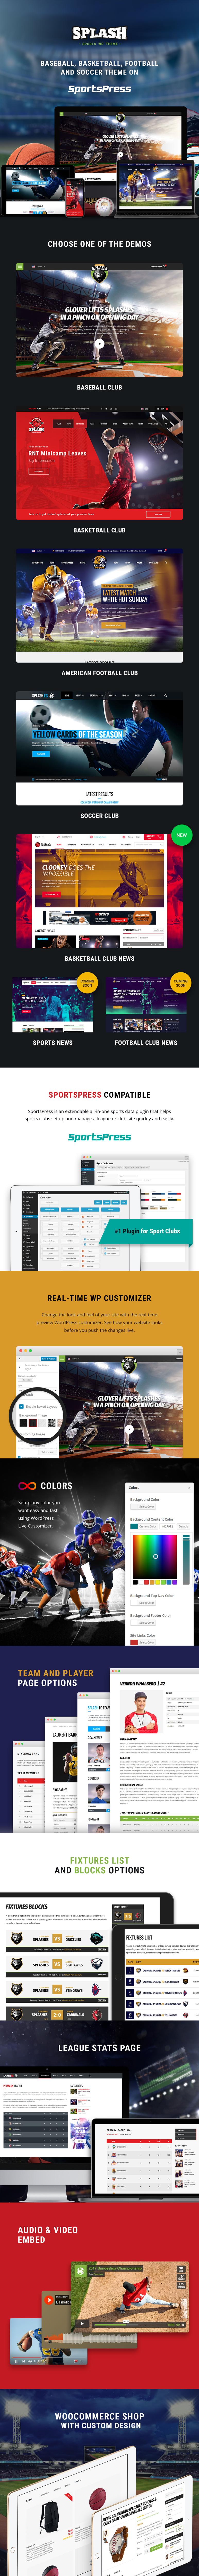 splash2 - Splash - WordPress Sports Theme for Basketball, Football, Soccer and Baseball Clubs